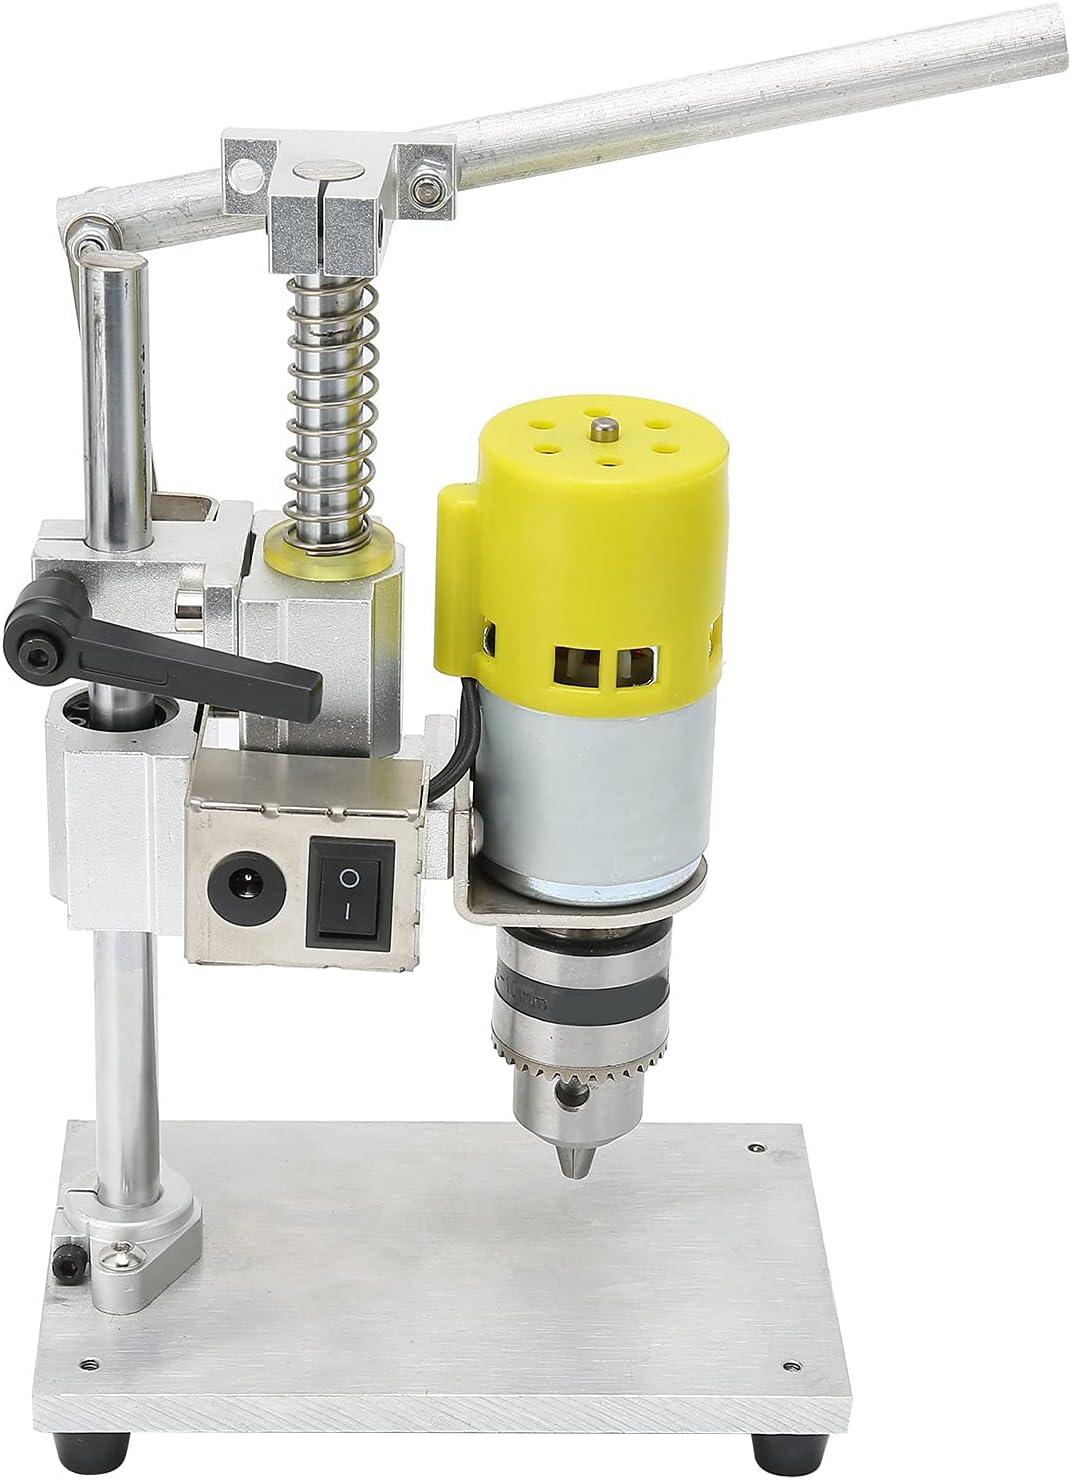 Eujgoov Benchtop Drill Press Brass Aluminu Core Motor B12 Chuck Free Shipping Max 71% OFF New